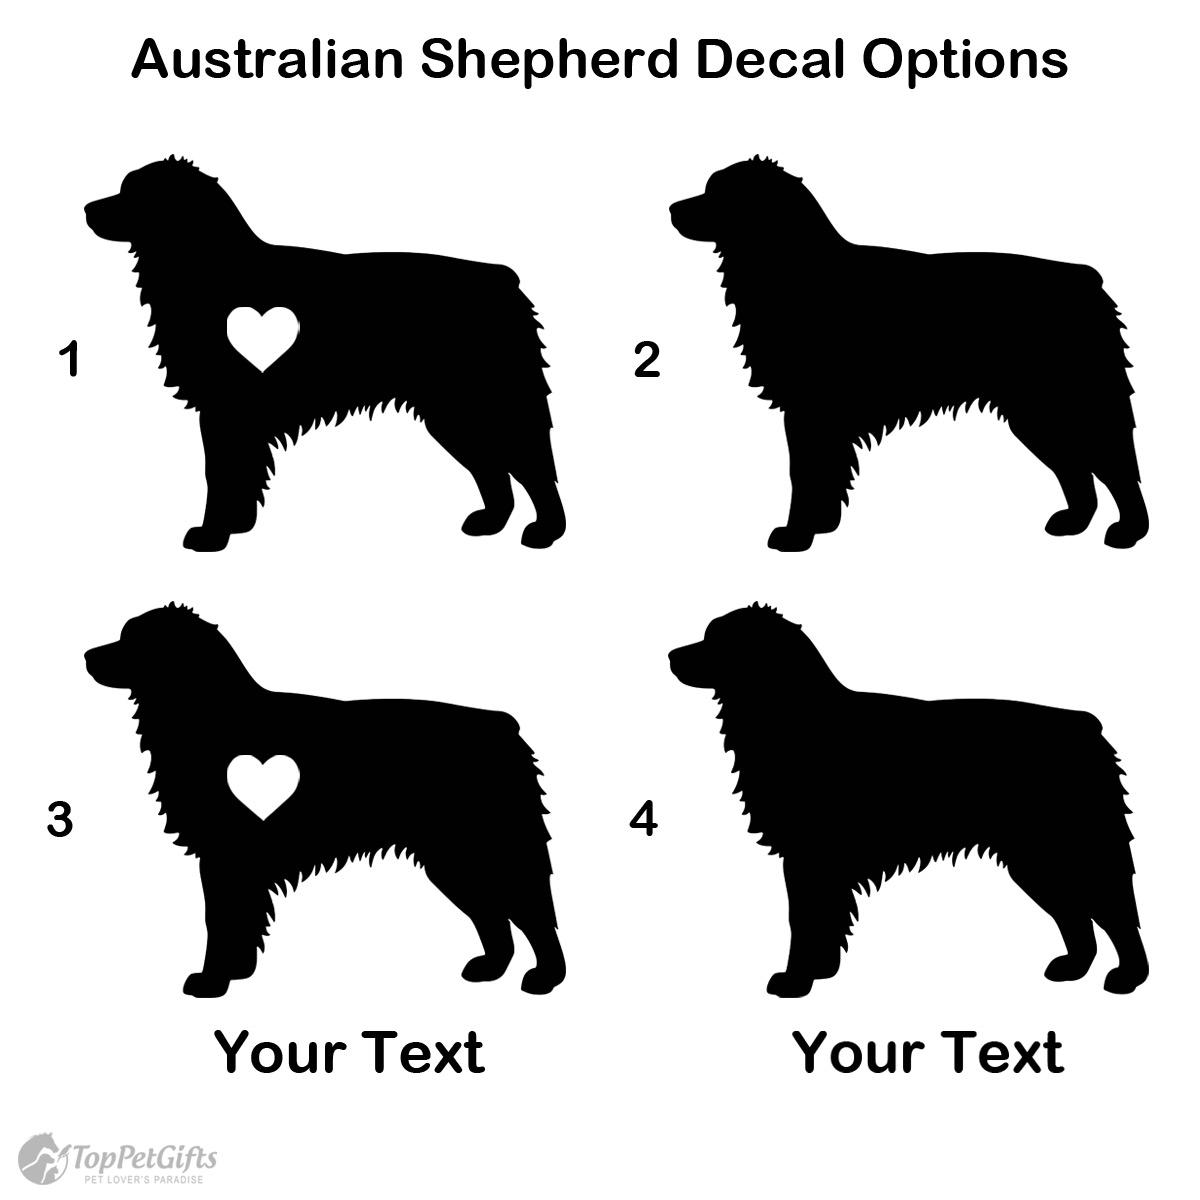 Personalized Australian Shepherd Decal